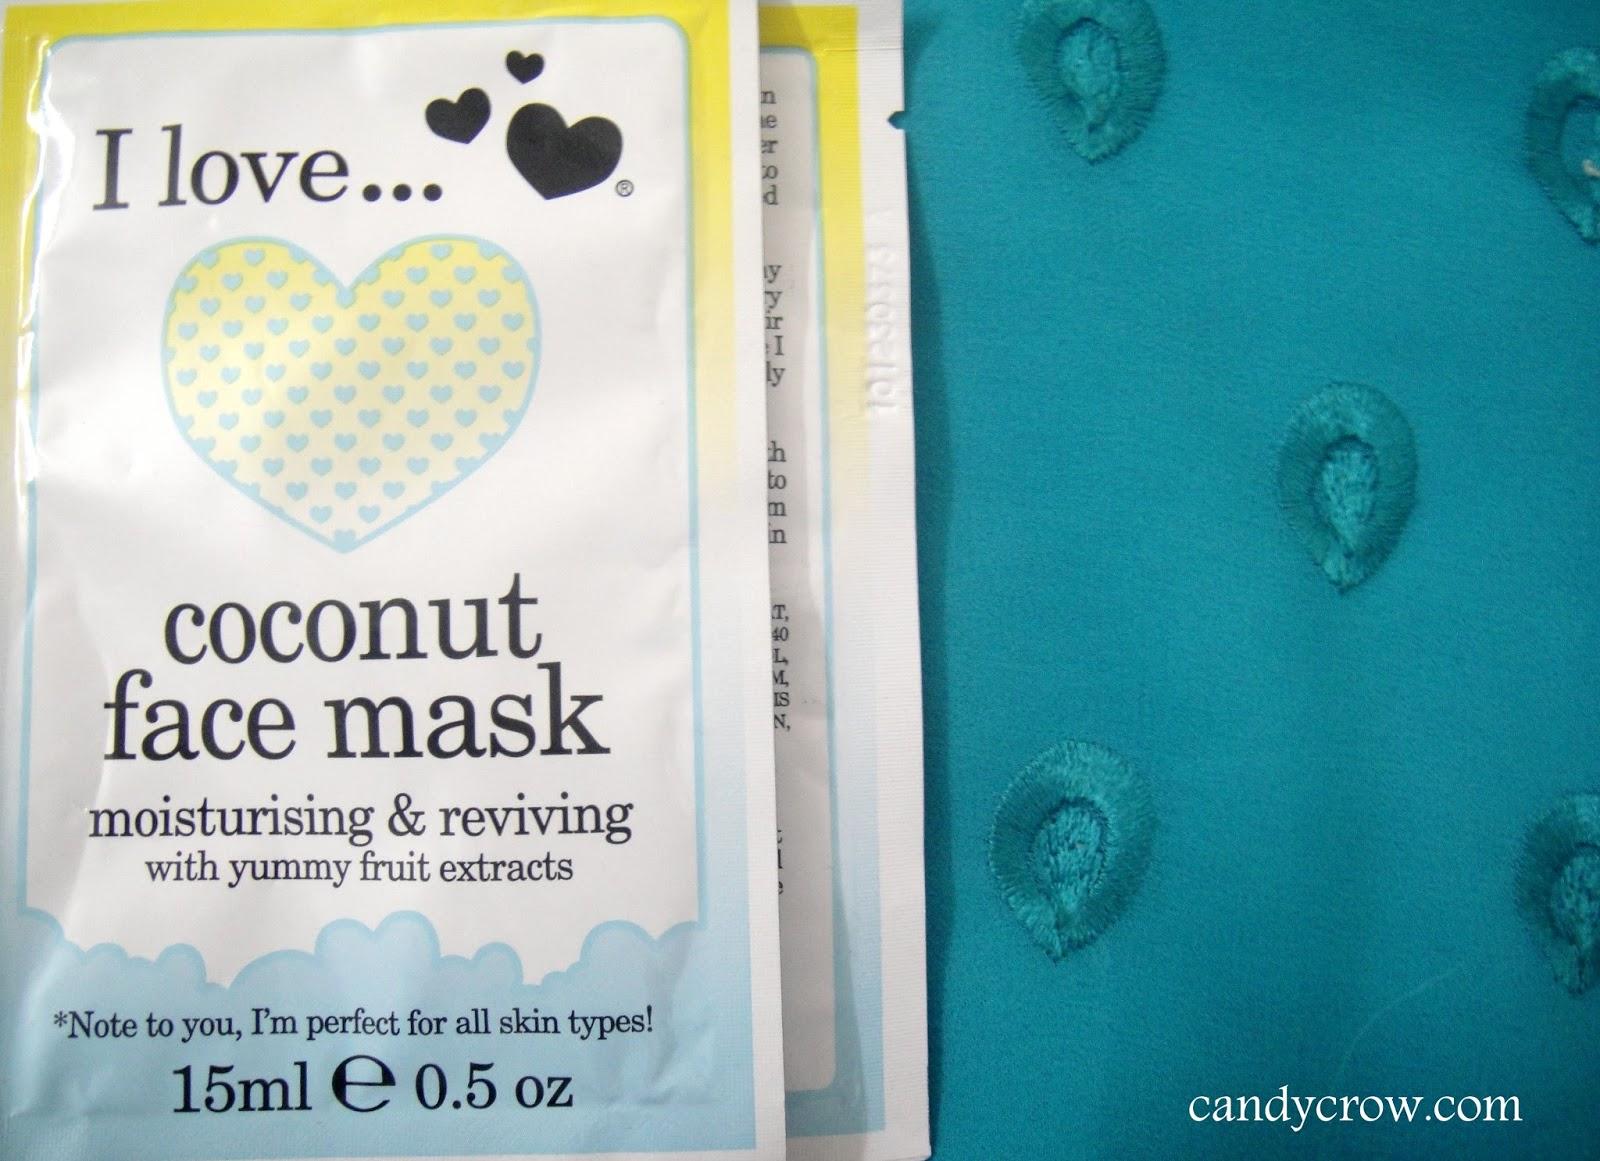 I Love... Coconut Mask